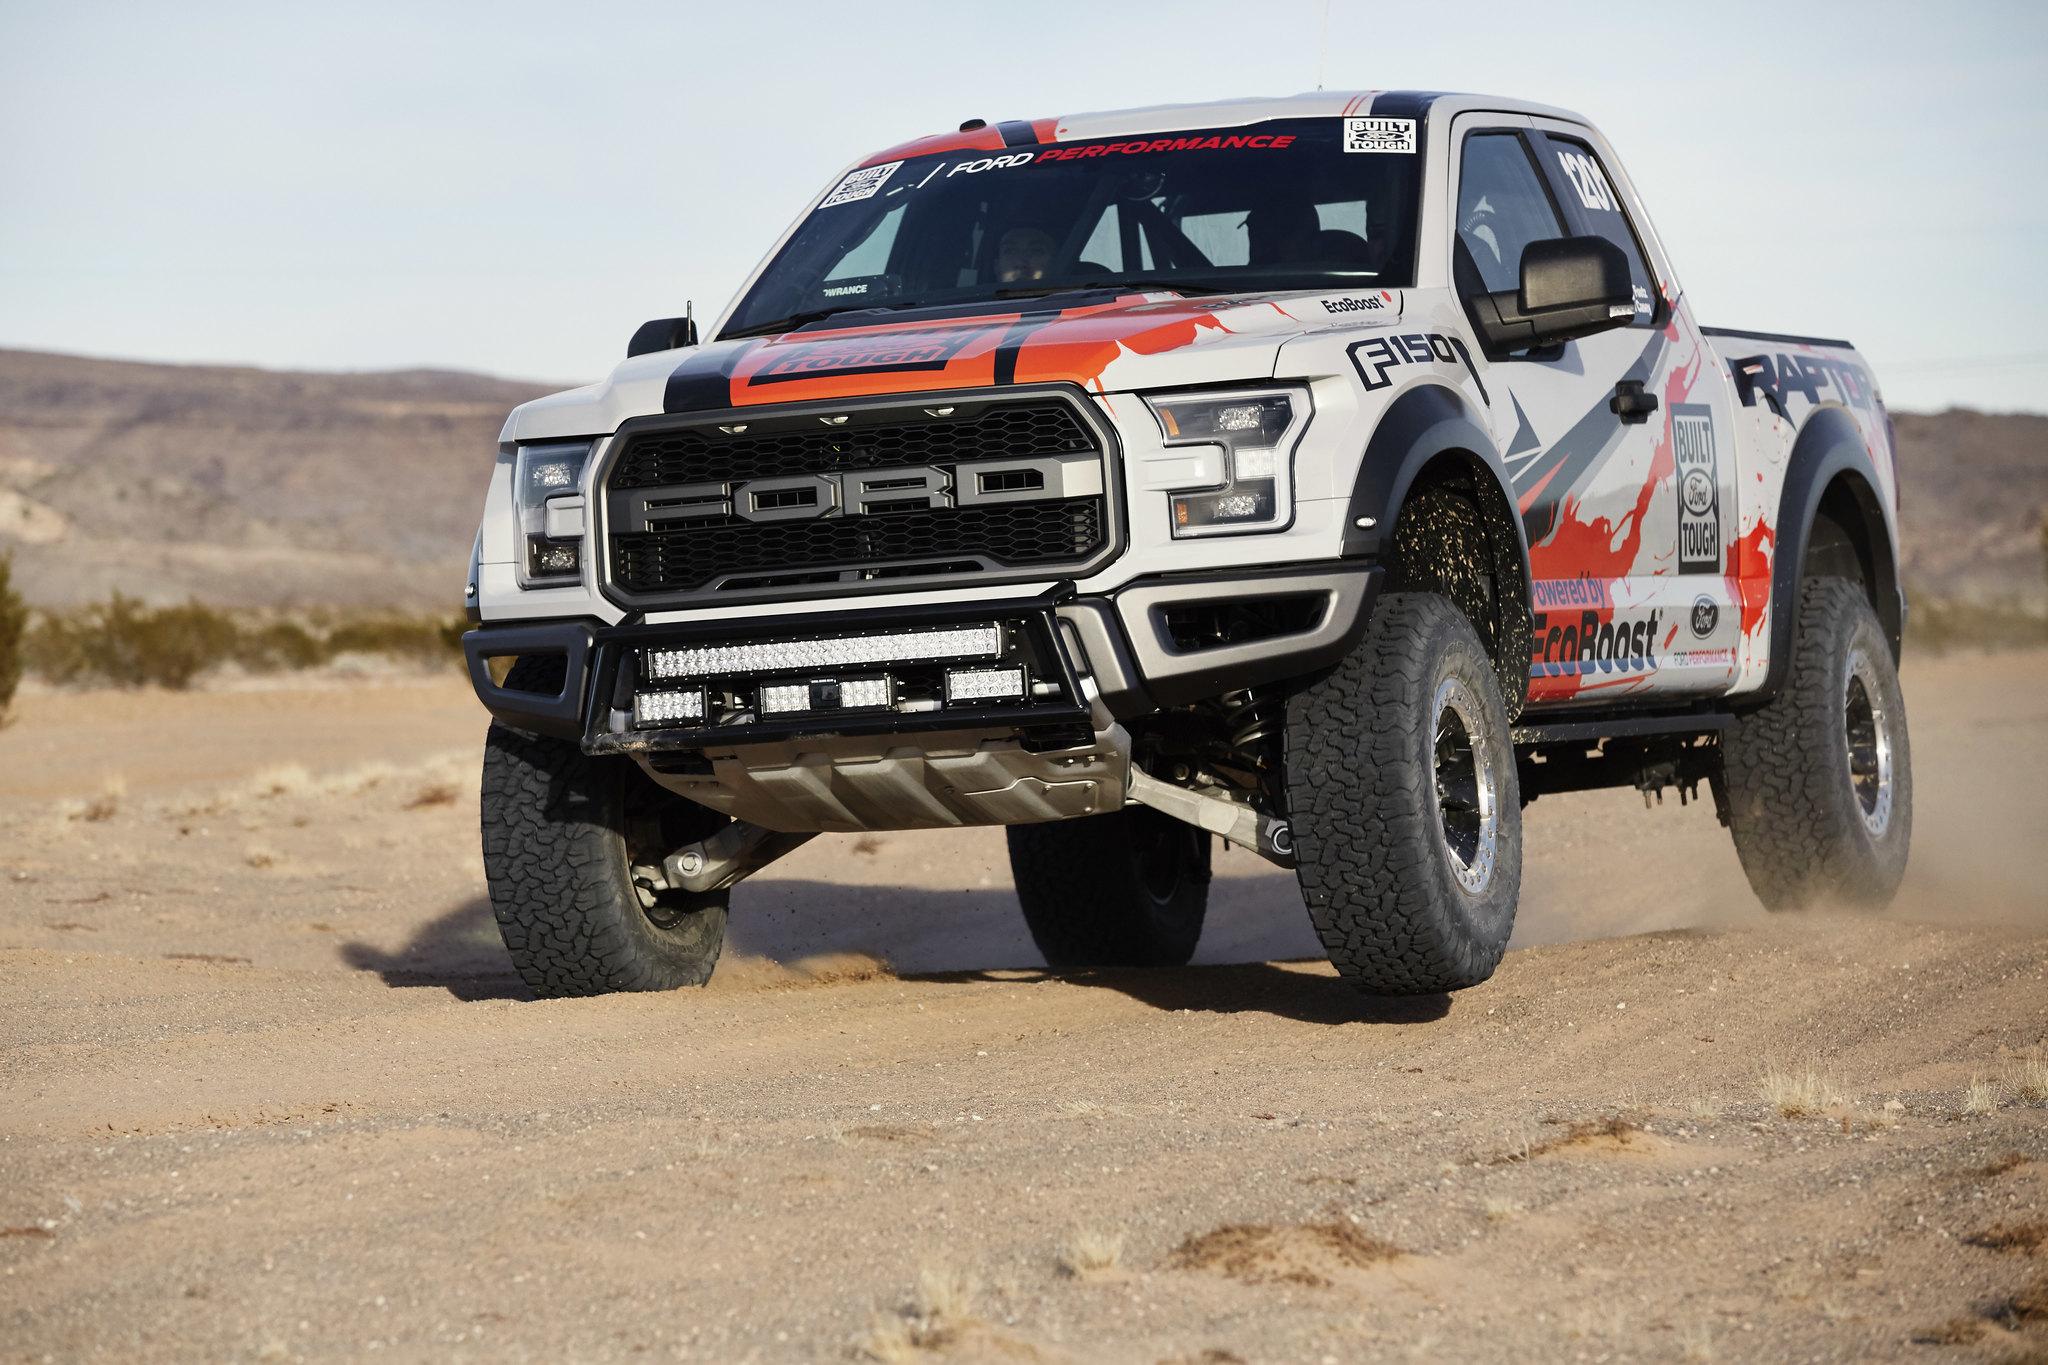 2017 Ford F-150 Raptor prepares for grueling off-road racing series